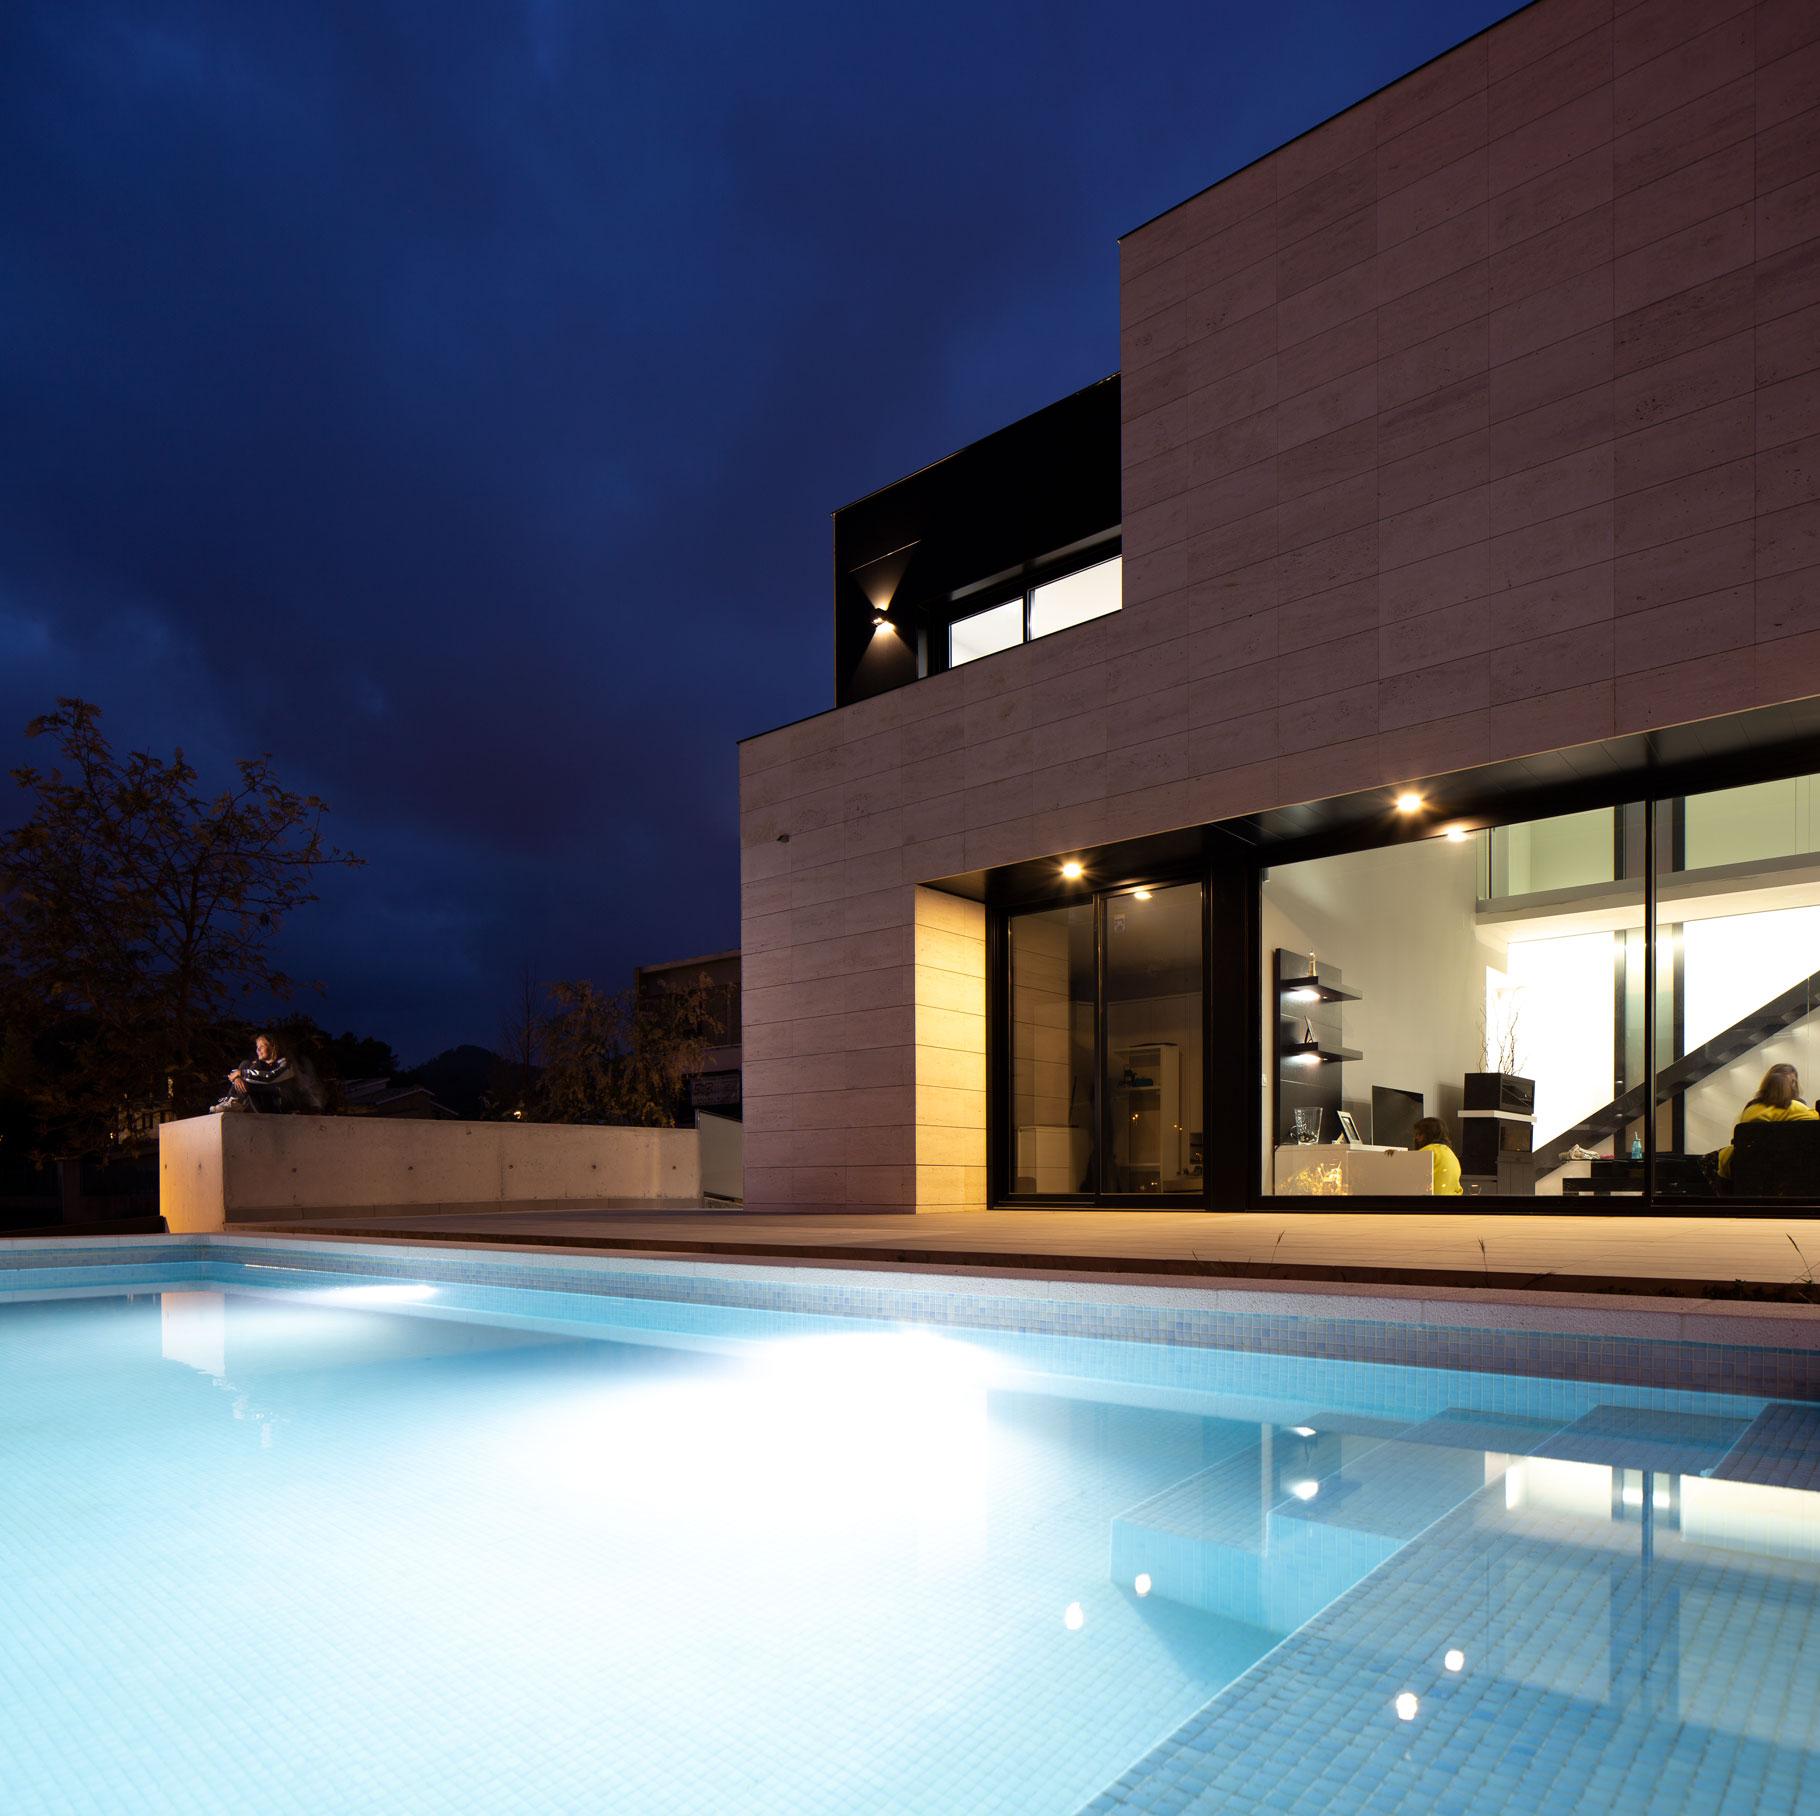 Fotografo de Arquitectura SG1923_2168-2